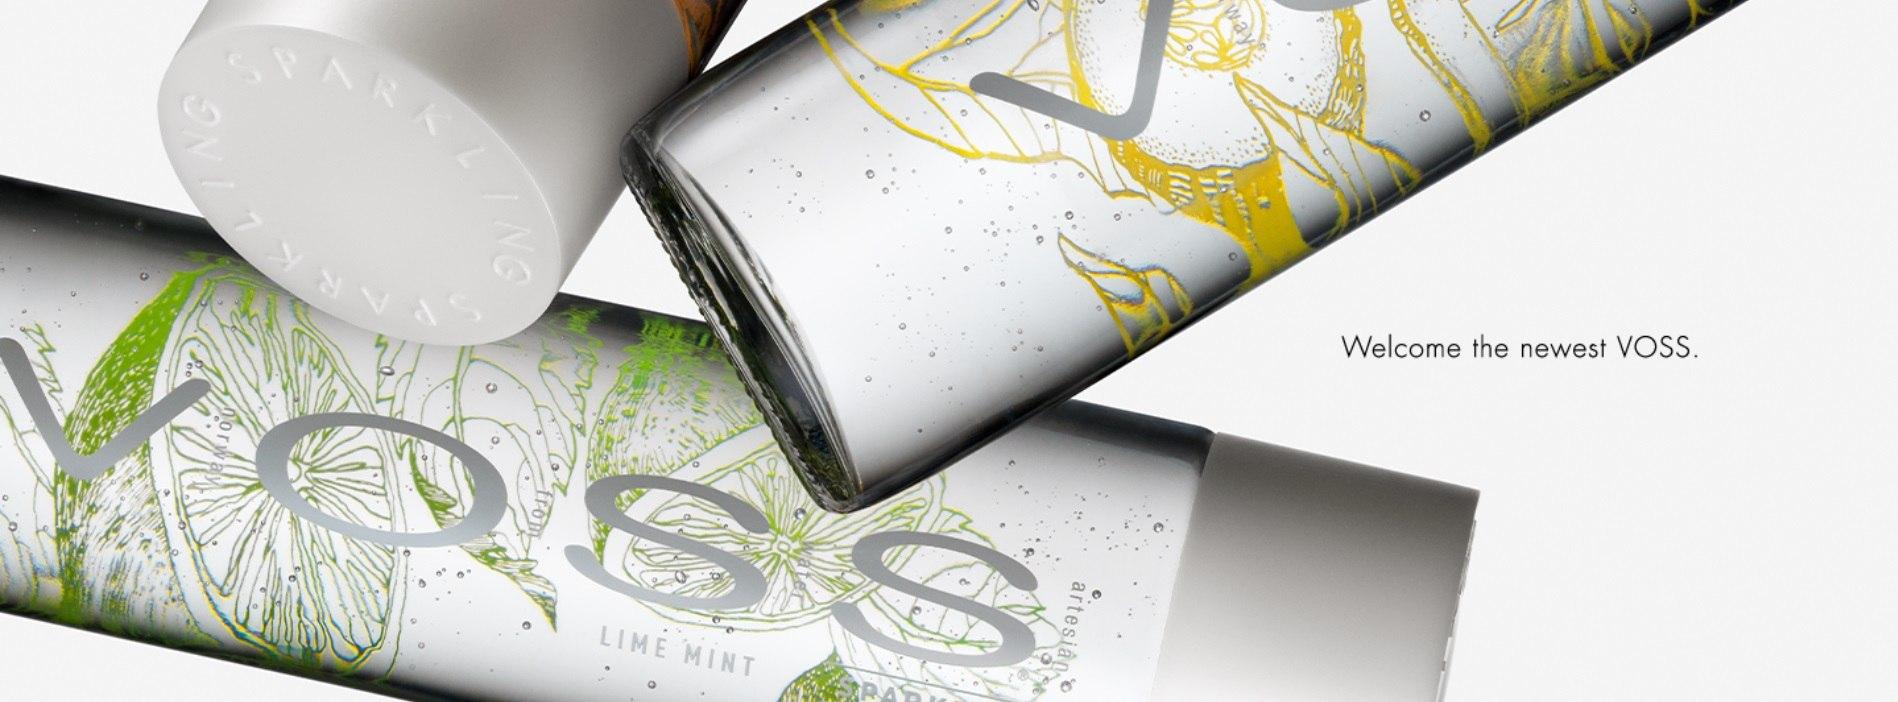 >vosswater: Vosswater是來自挪威的氣泡水,玻璃瓶身由設計師專業設計,瓶蓋有立體凸印更添加時尚設計感,這款氣泡是許多時尚名人的愛用者,維密模特兒、還有之前的電影「格雷的五十道秘密」都可以看到這瓶氣泡水的身影~還被譽為水中的勞斯萊斯,是不是浮誇XDD除了一般原味外,還推出了檸檬薄荷、橘子檸檬、檸檬黃瓜,三種口味。